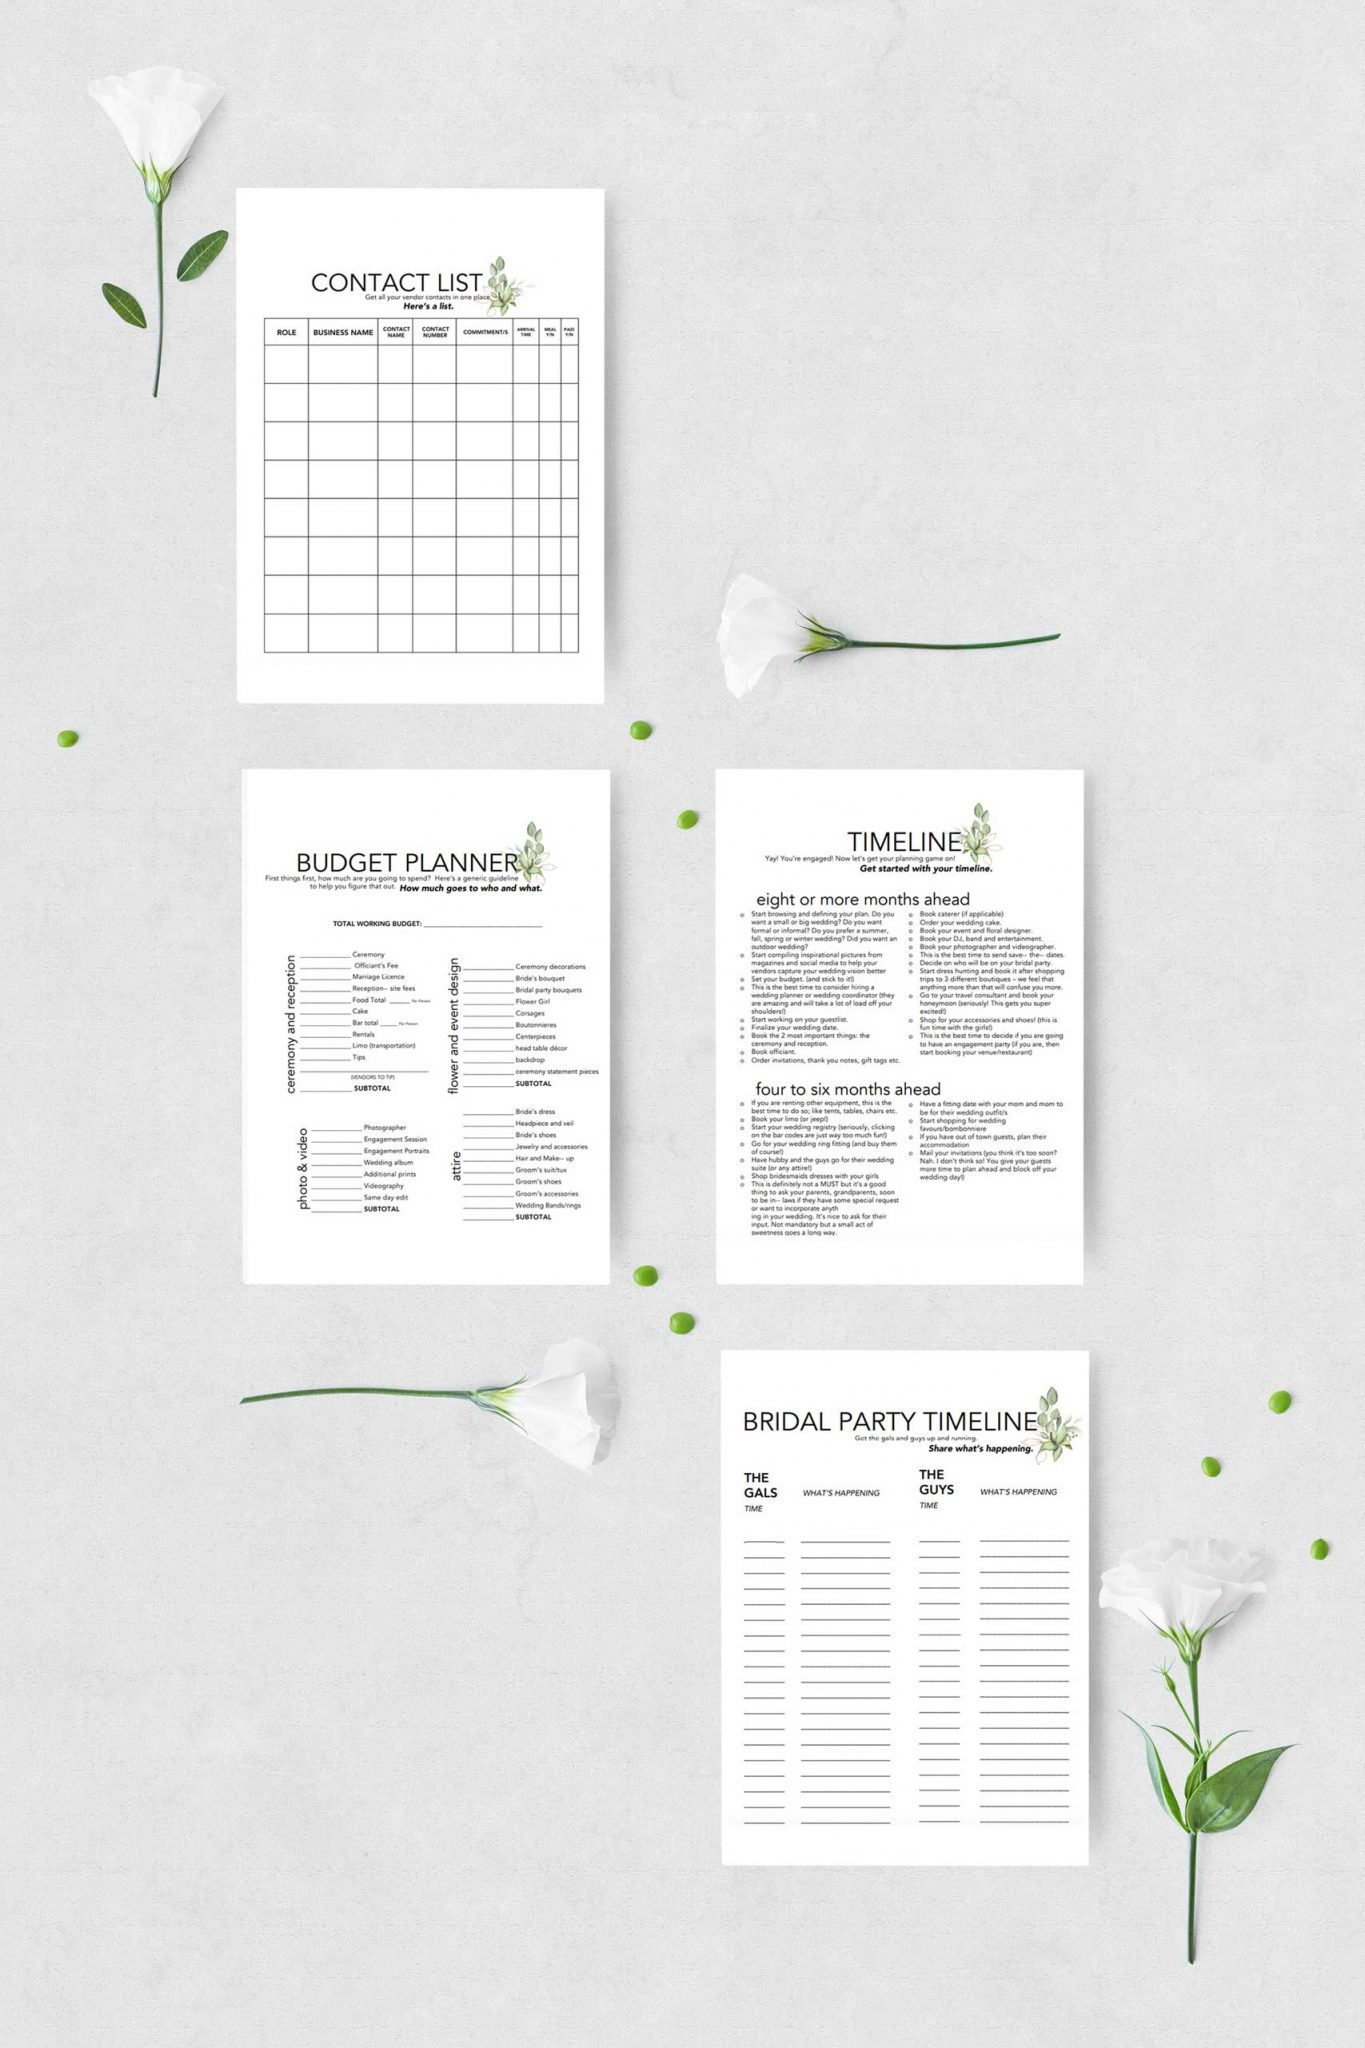 FREE WEDDING PRINTABLES: Planning Binder, Invitation Suite and Minimalist Signs - 2